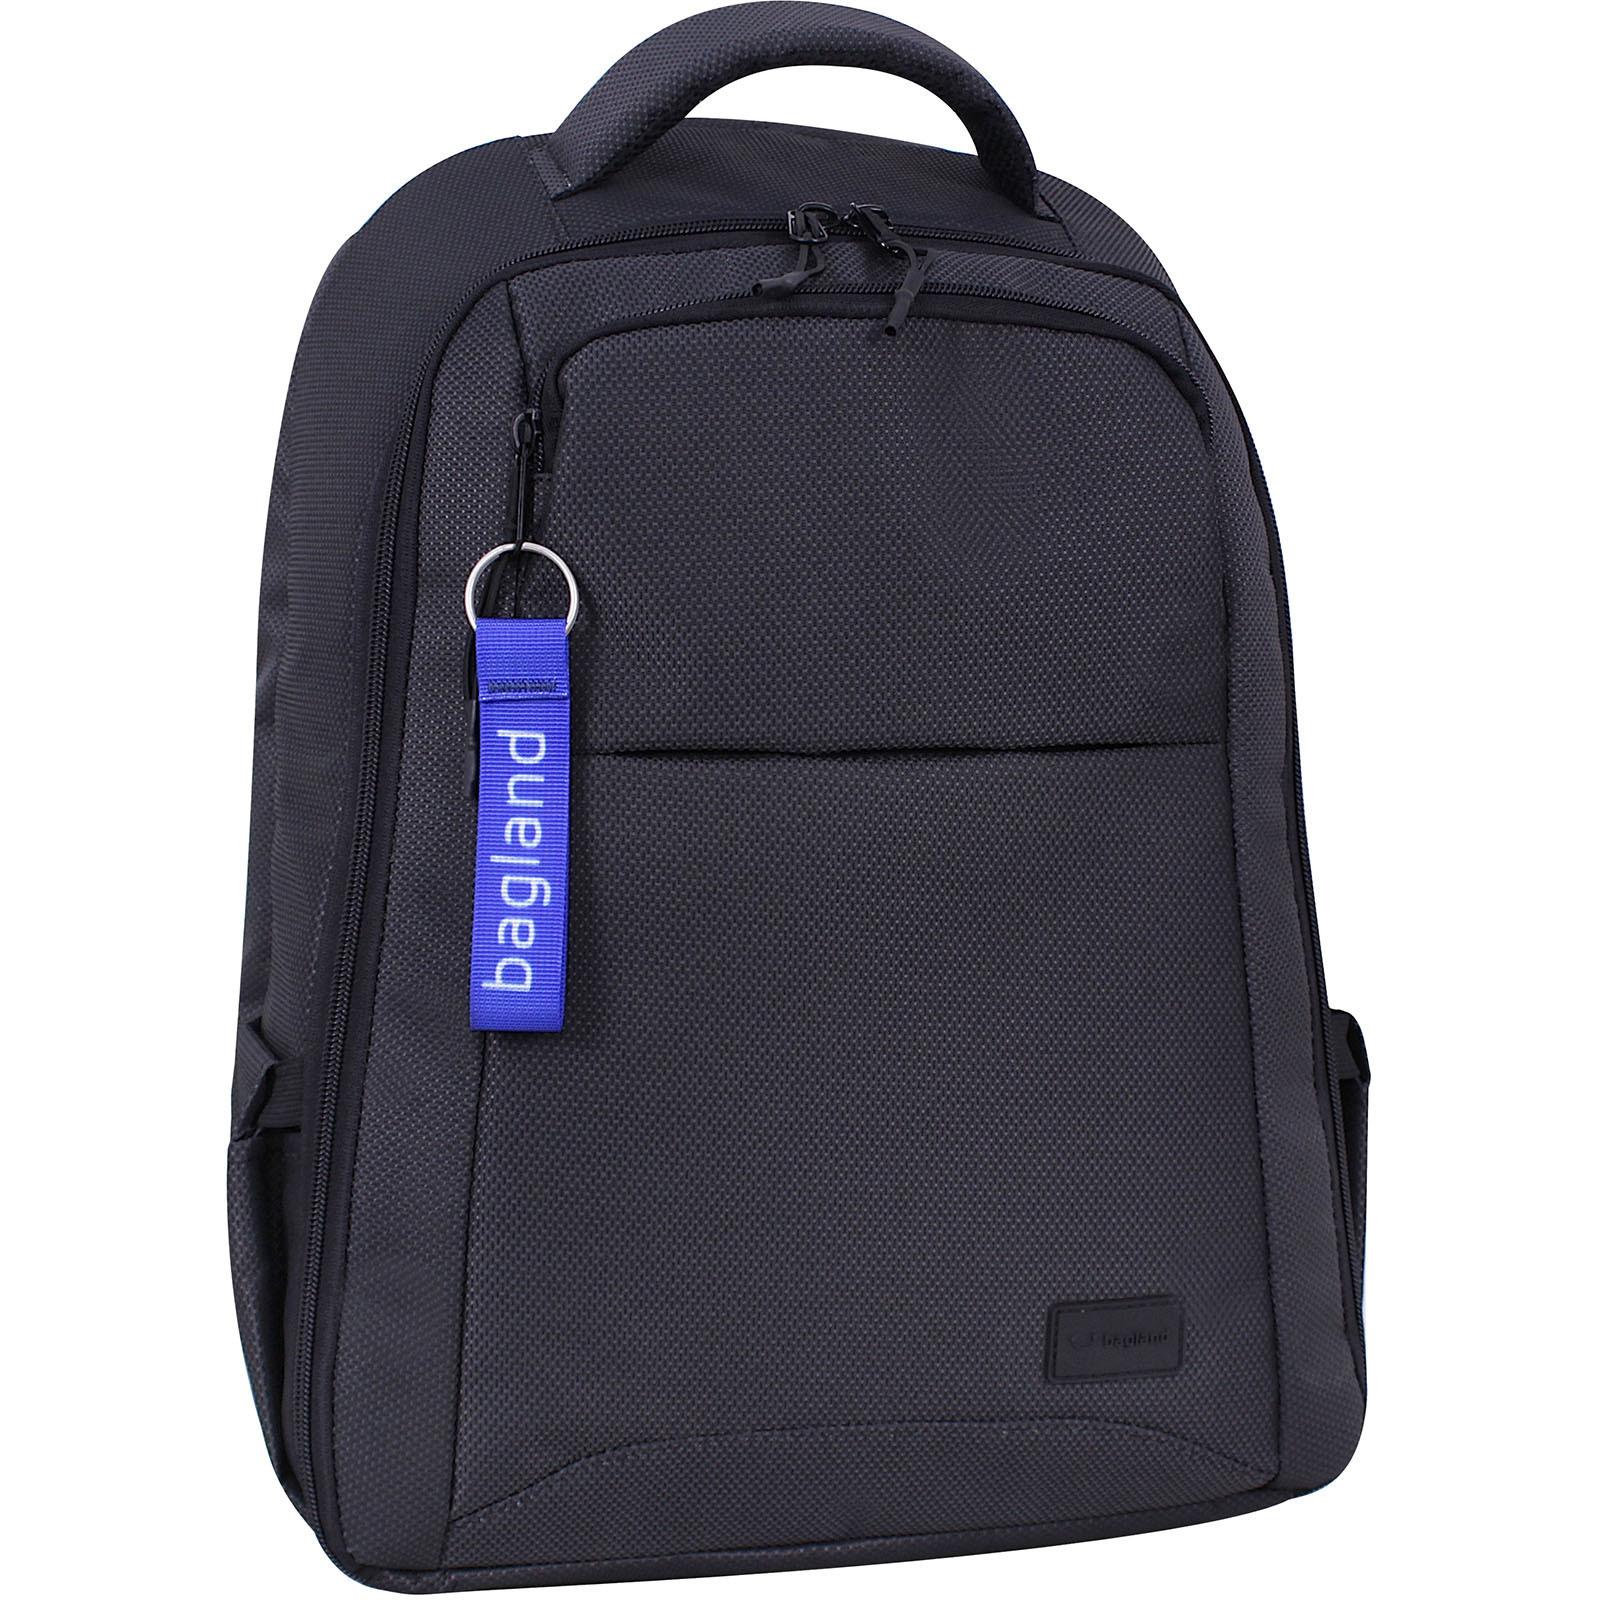 Мужские рюкзаки Рюкзак Bagland Бремен 23 л. Чёрный (00165169) IMG_7079.JPG